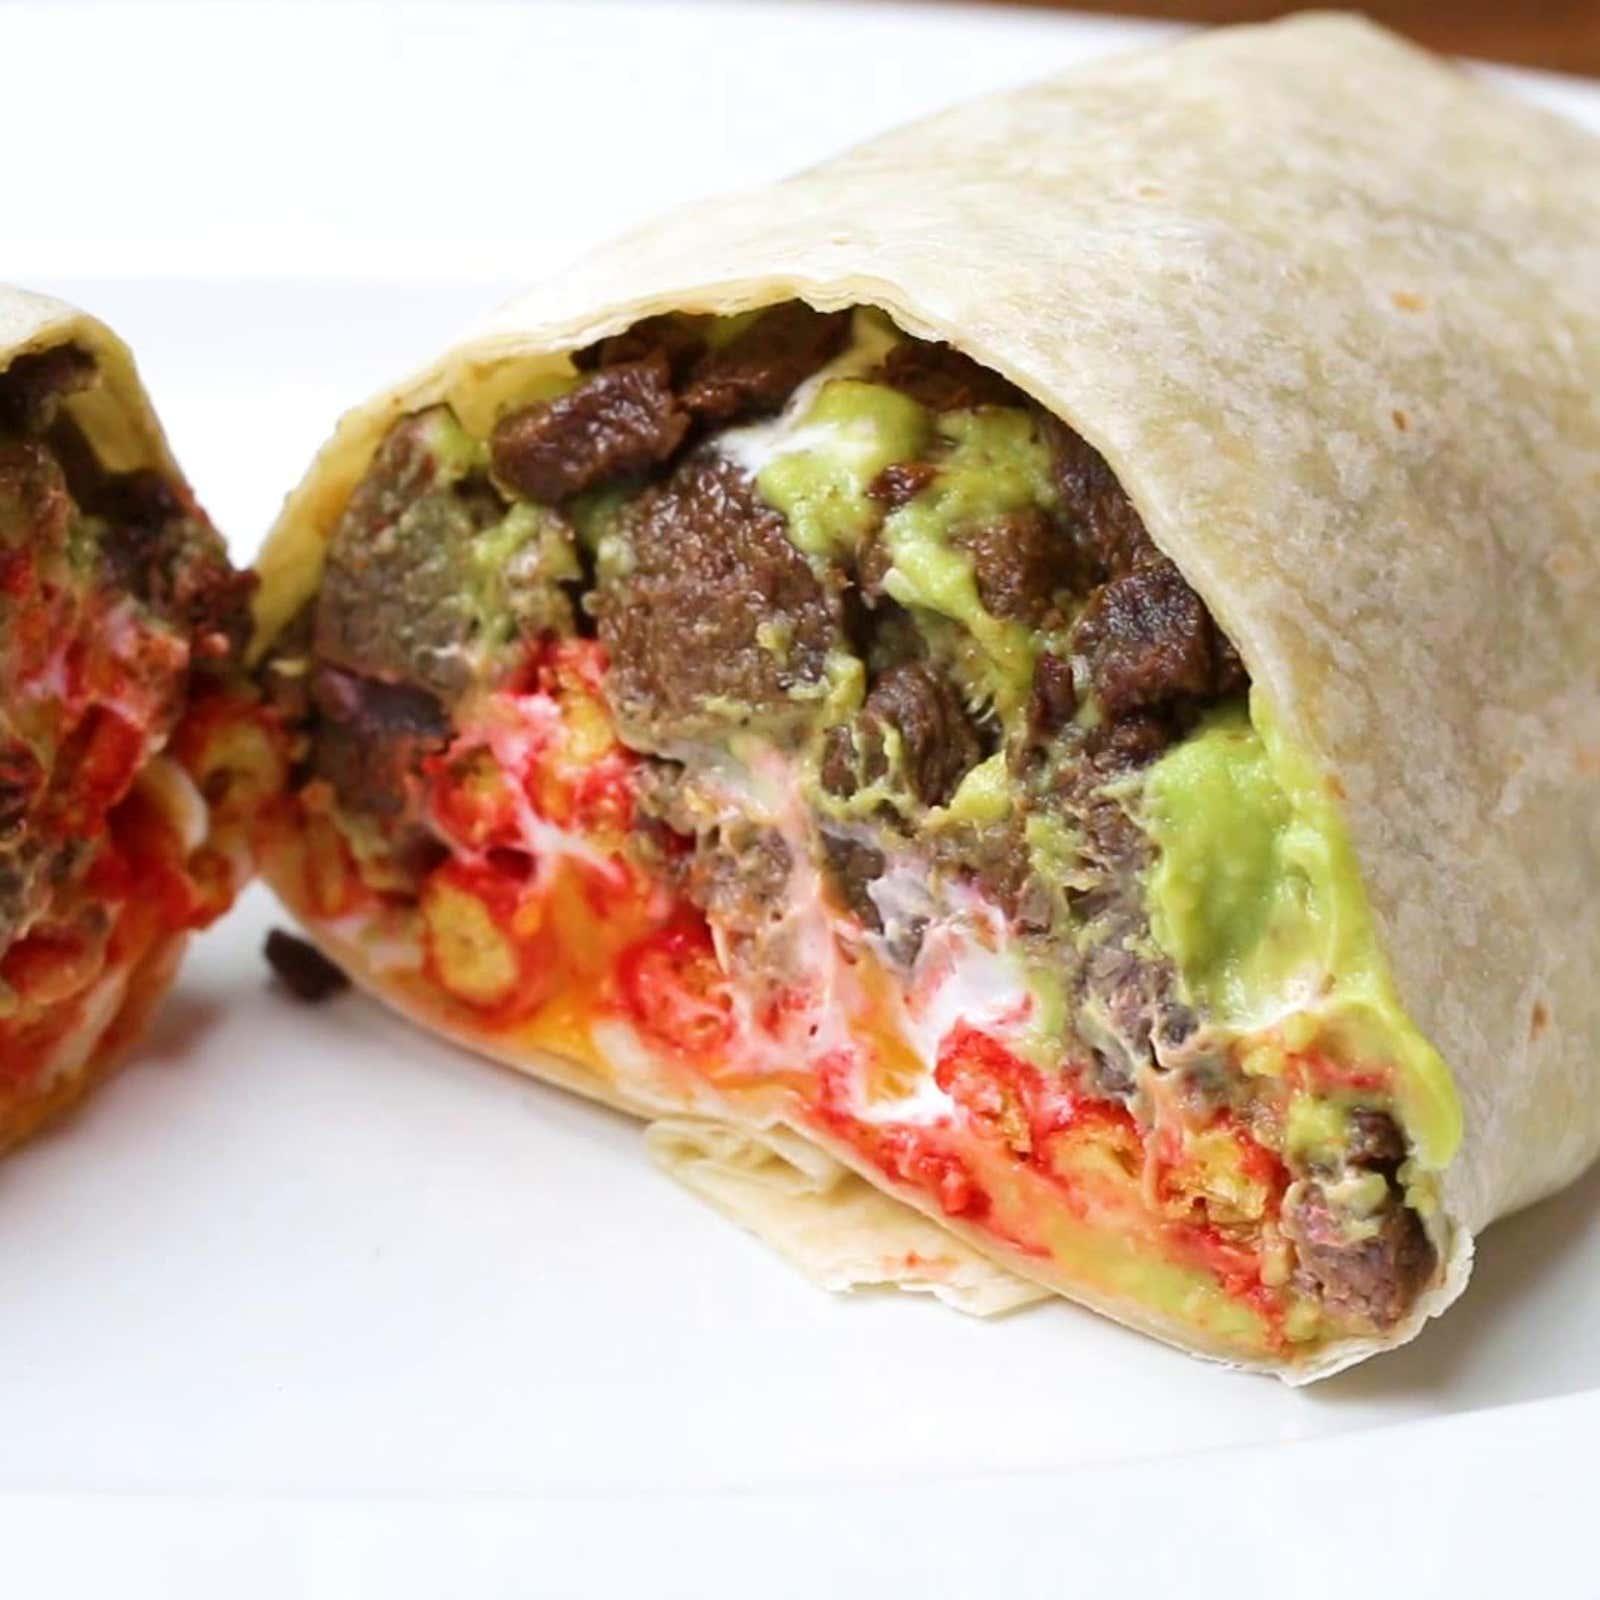 Hot Cheeto Burrito